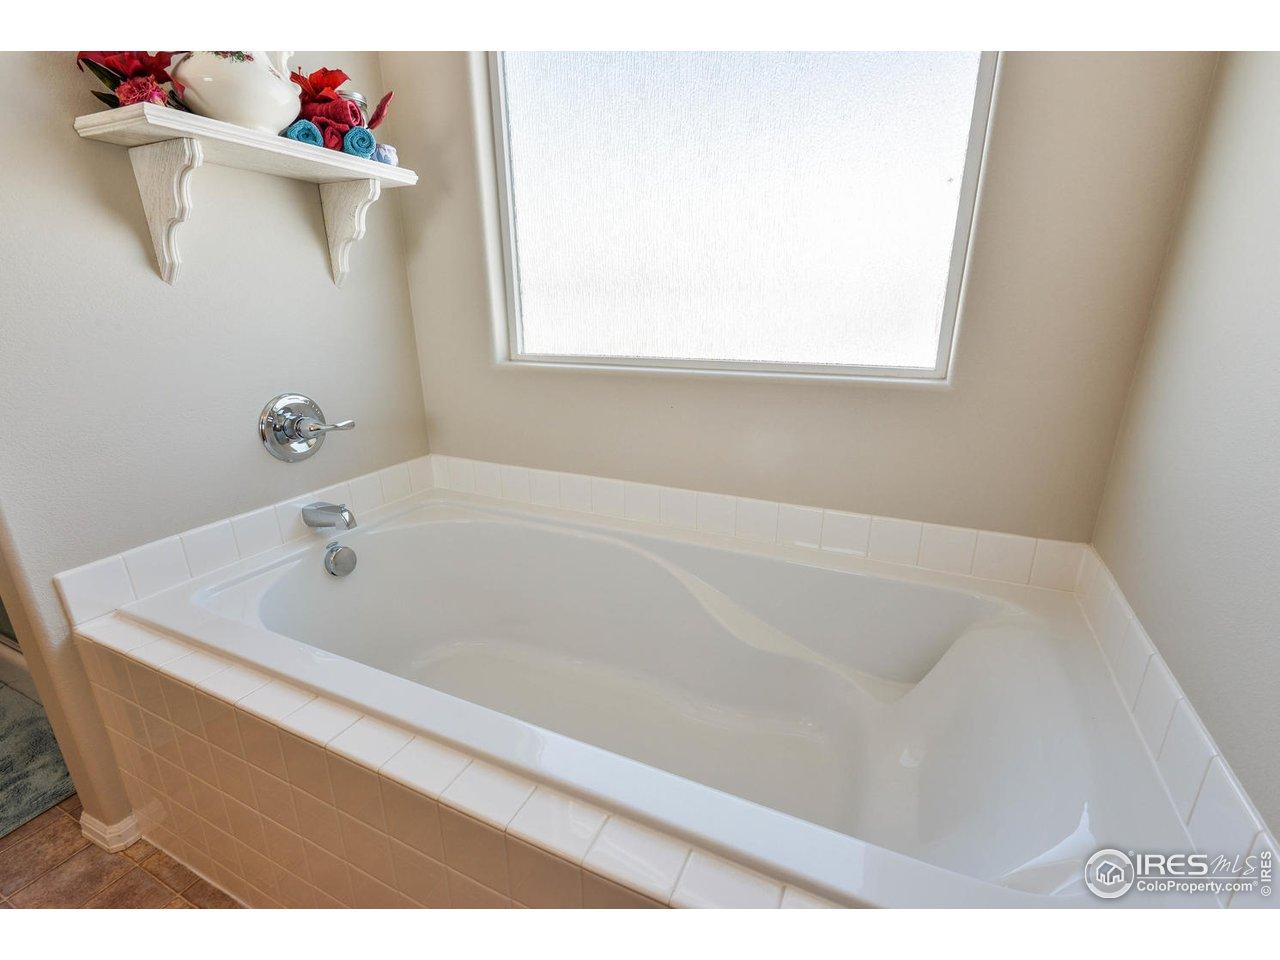 Deep, extra-long 6 foot soaking tub